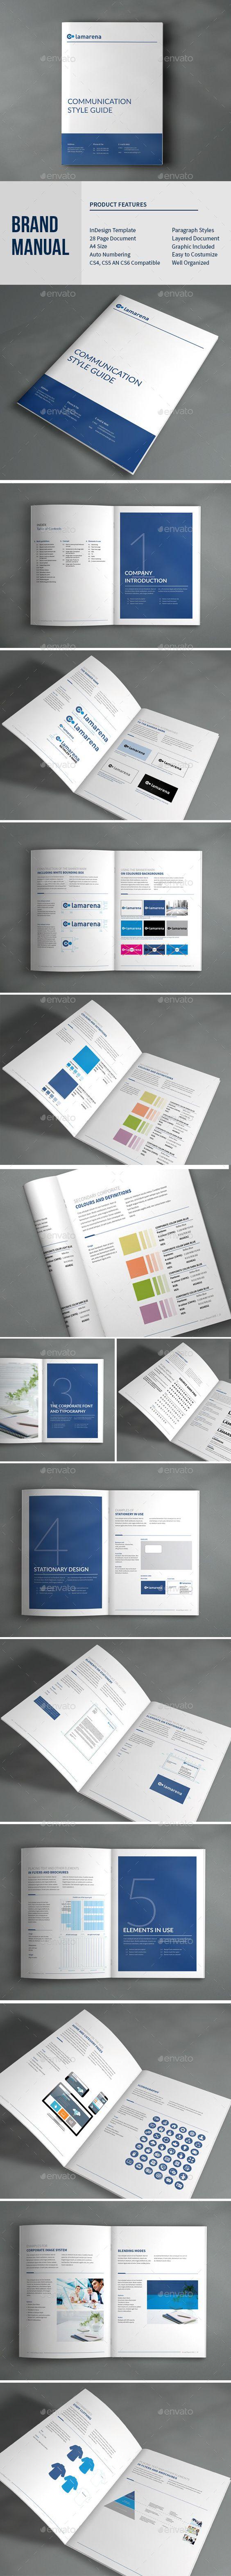 Brand Manual Brochure Template InDesign INDD #design Download: http ...